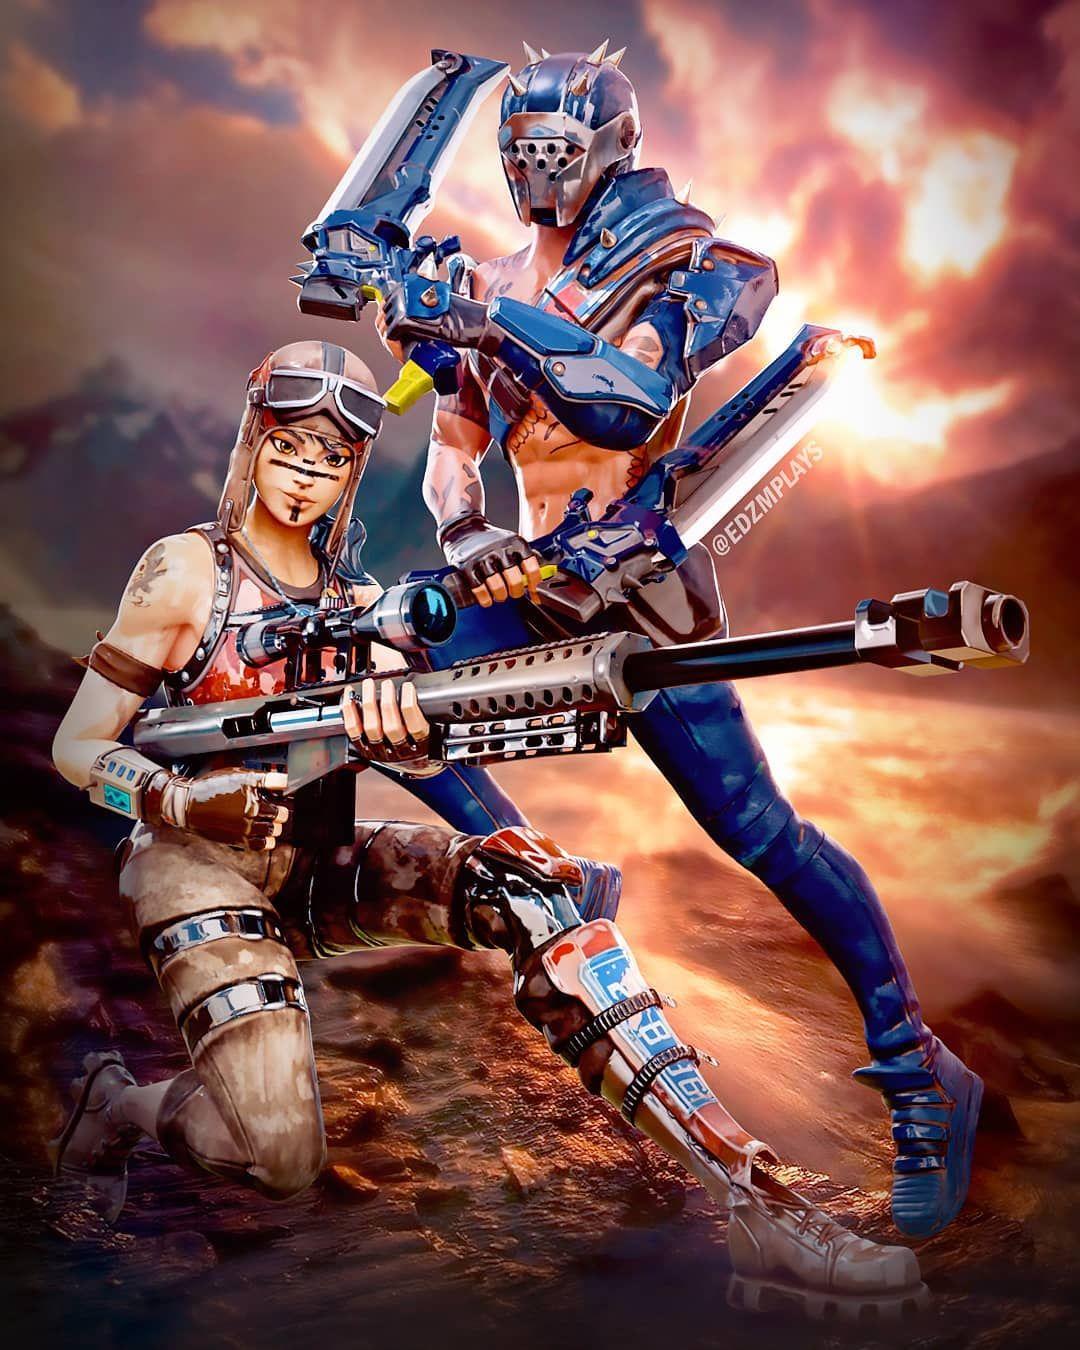 Pin by Joe Mullikin on Fortnite Best gaming wallpapers Gaming 1080x1350